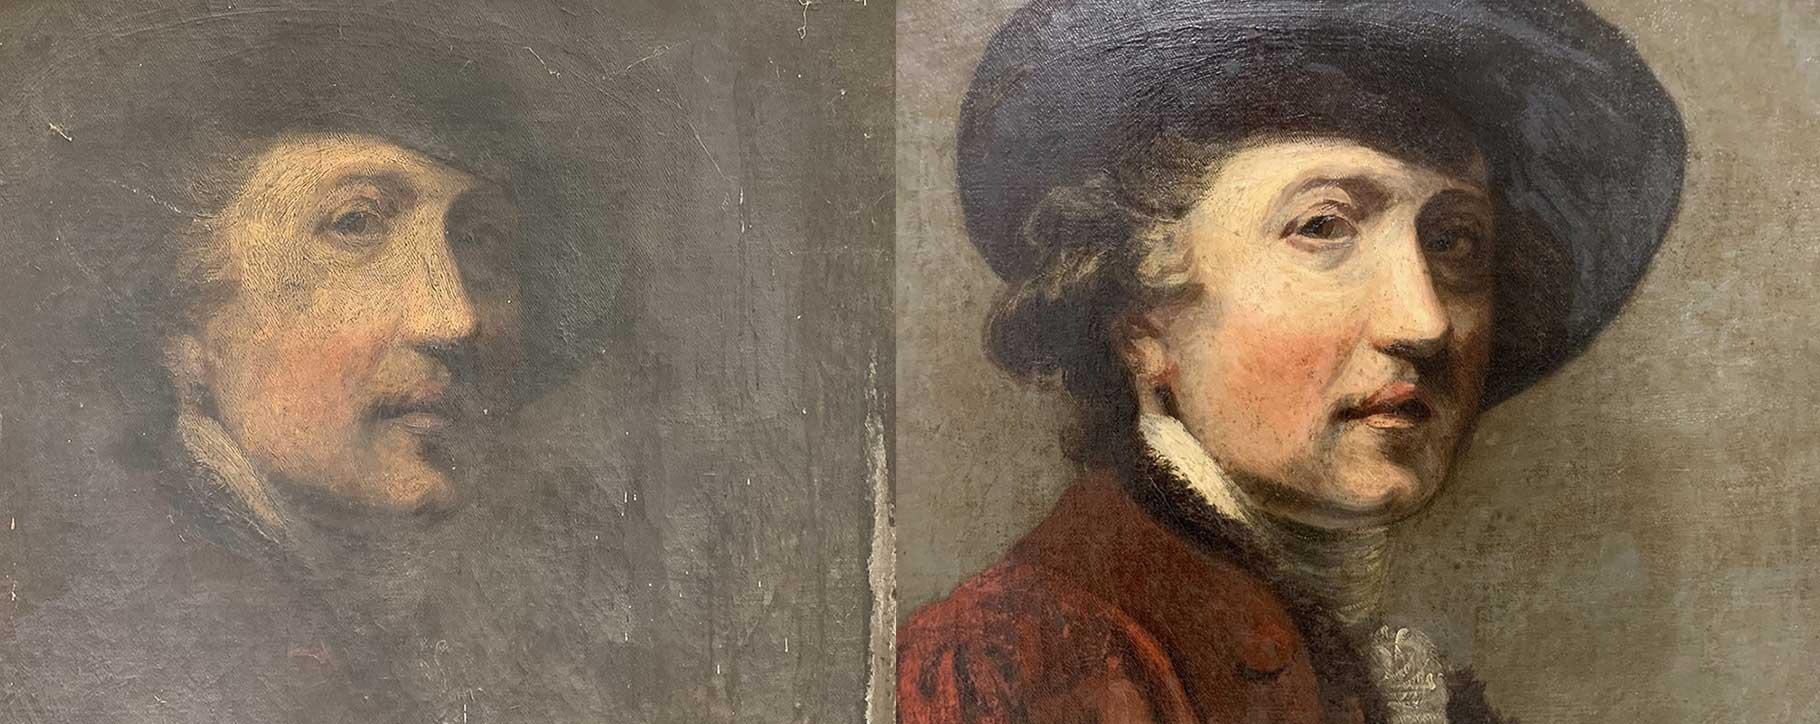 hidden features - a face on double canvas